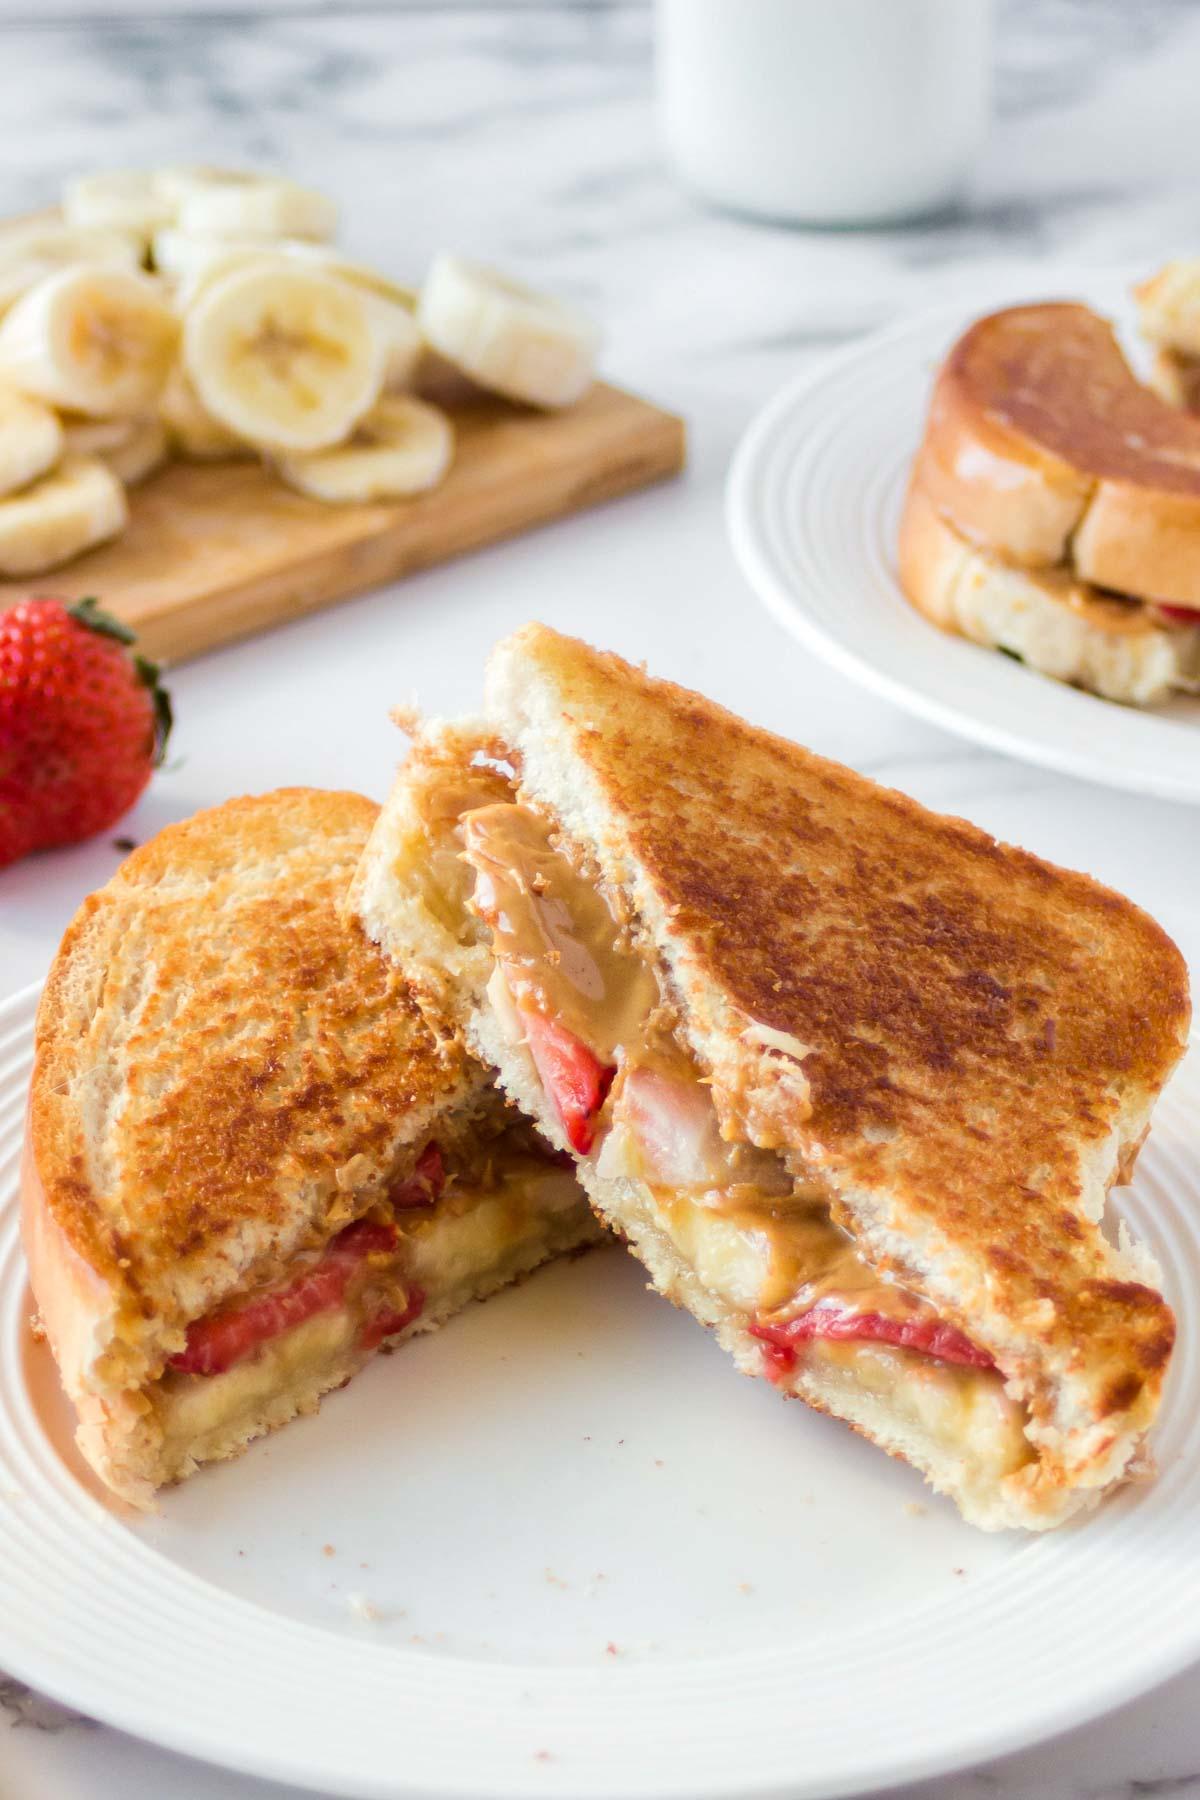 Grilled peanut butter honey sandwich on a plate.